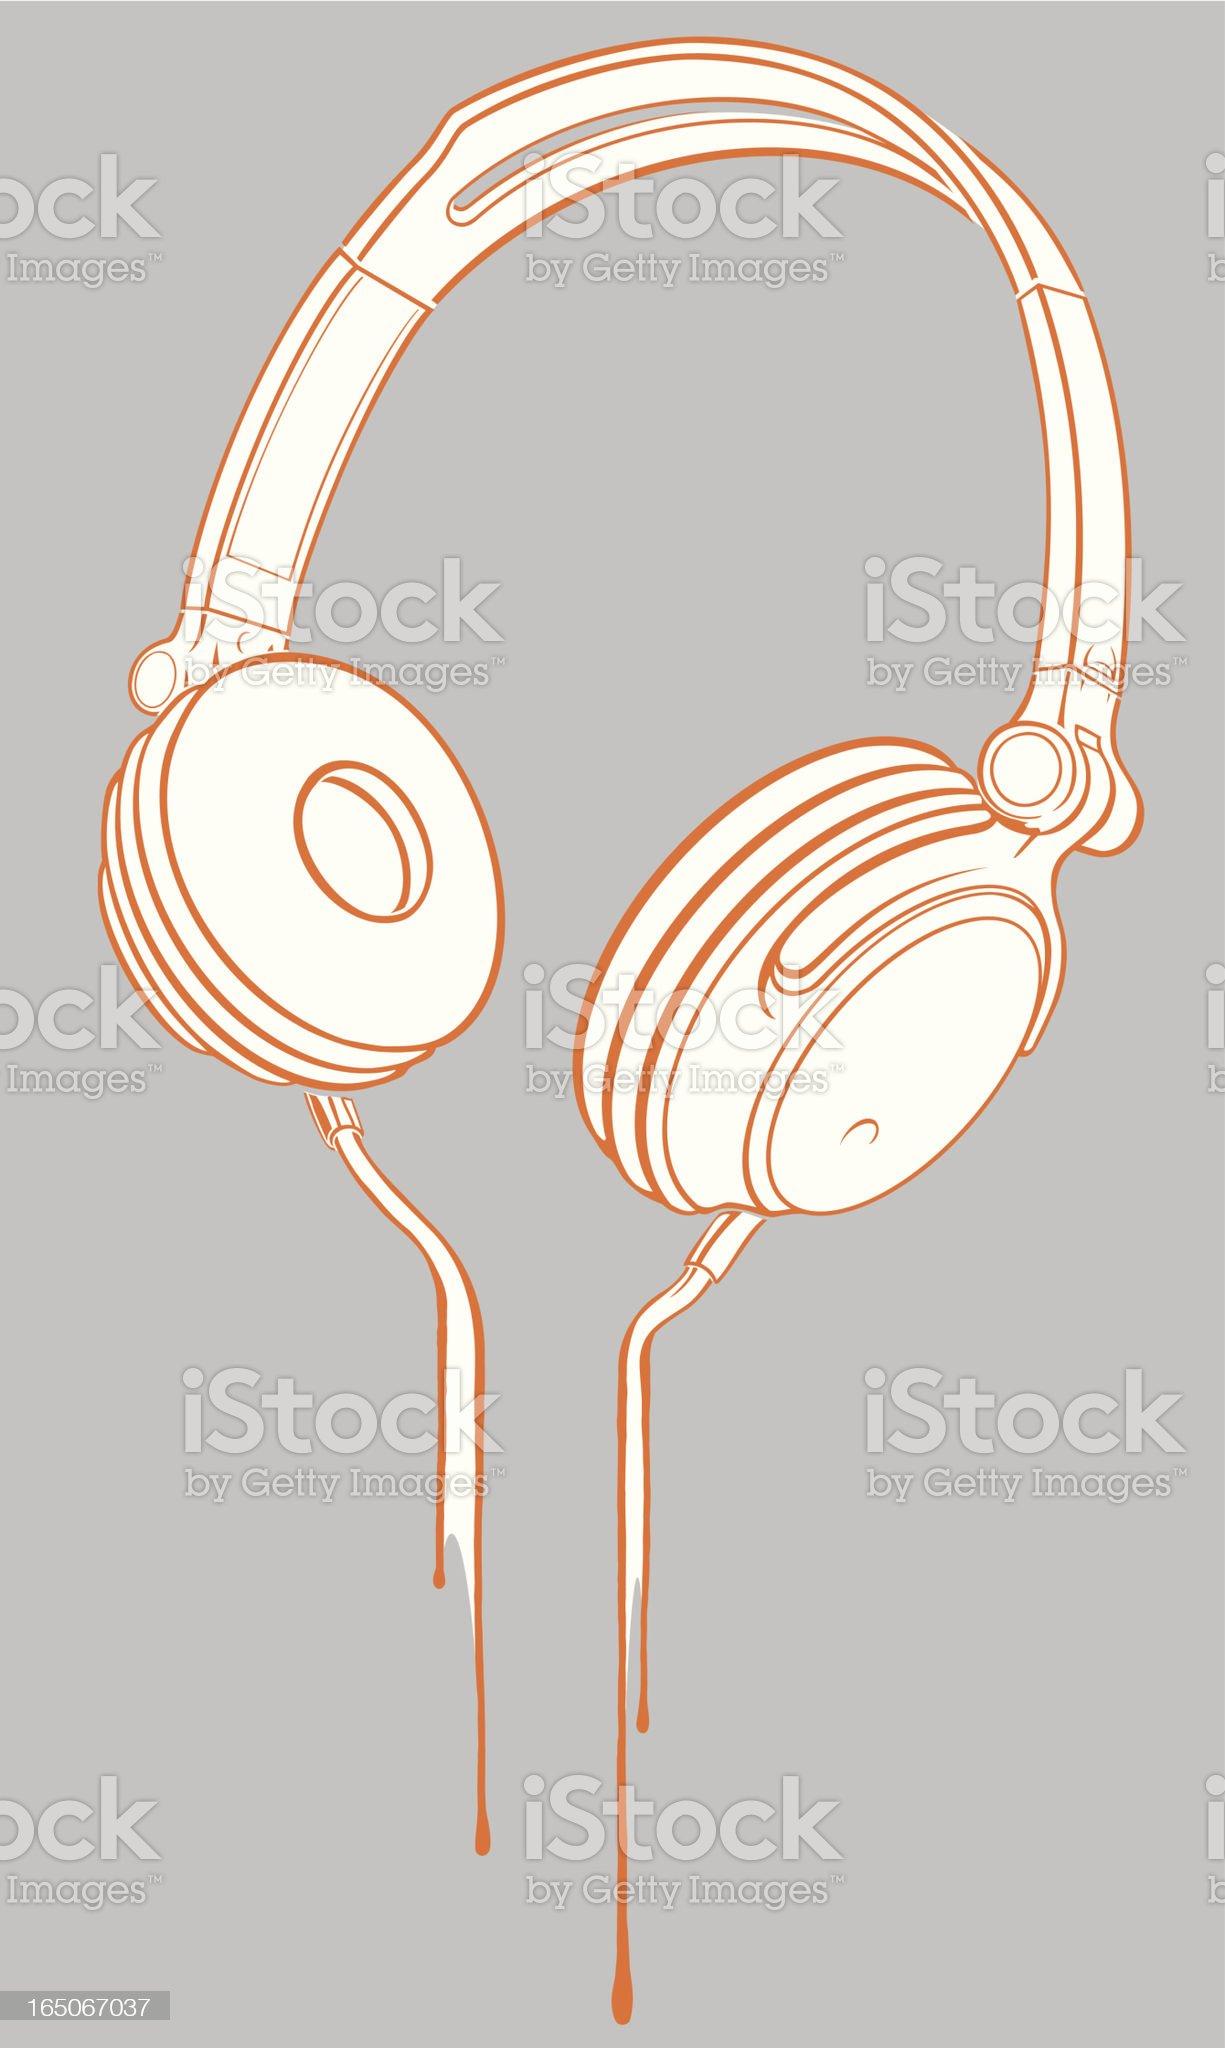 White and orange headphones on gray background royalty-free stock vector art